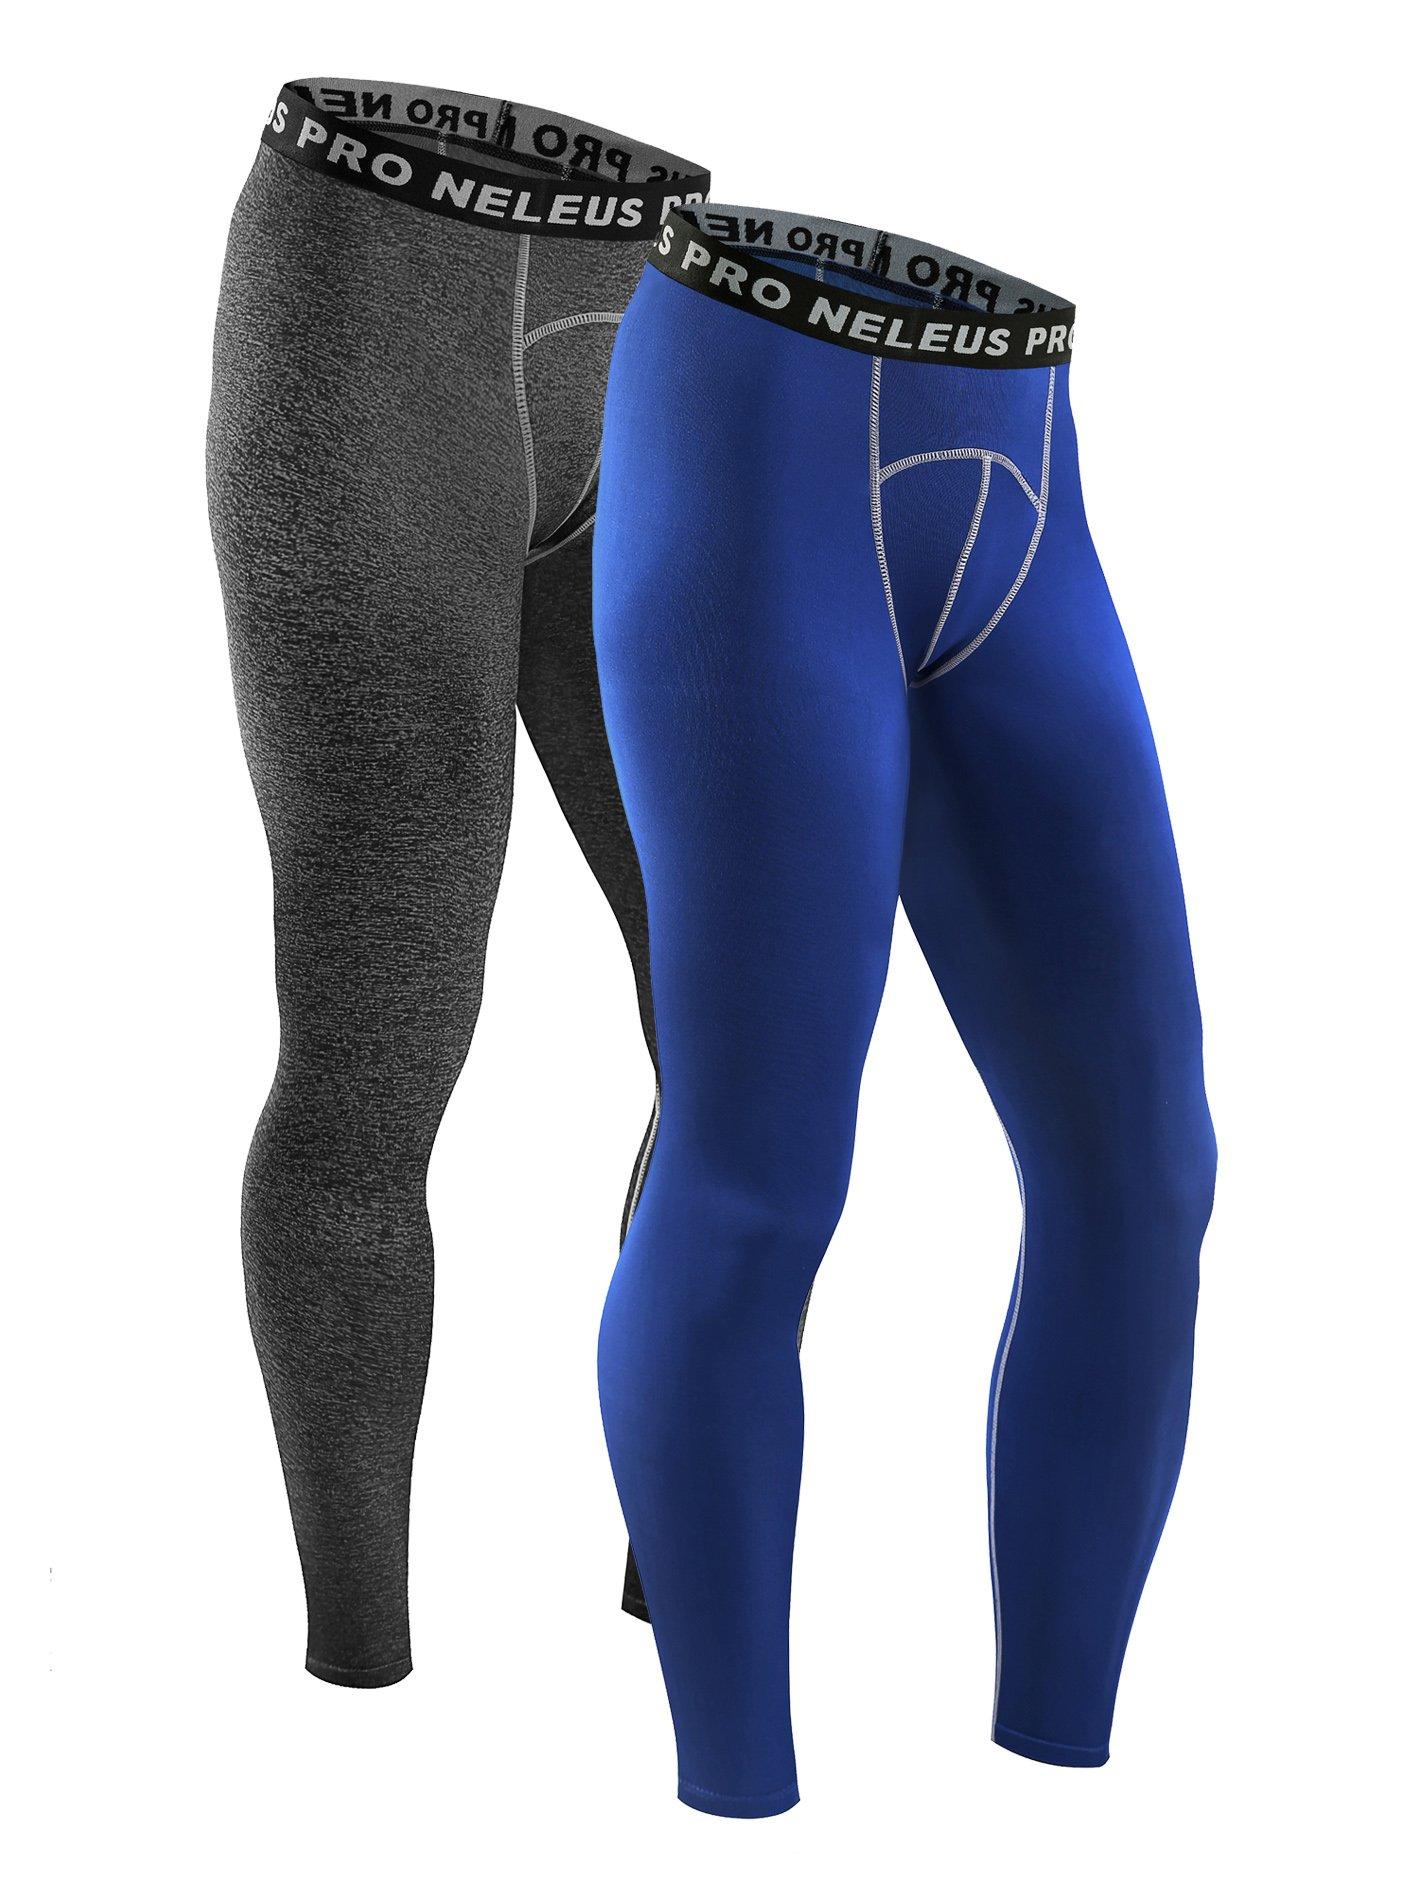 Neleus Men's 2 Pack Compression Pants Running Tights Sport Leggings,6026,Blue,Grey,S,EUR M